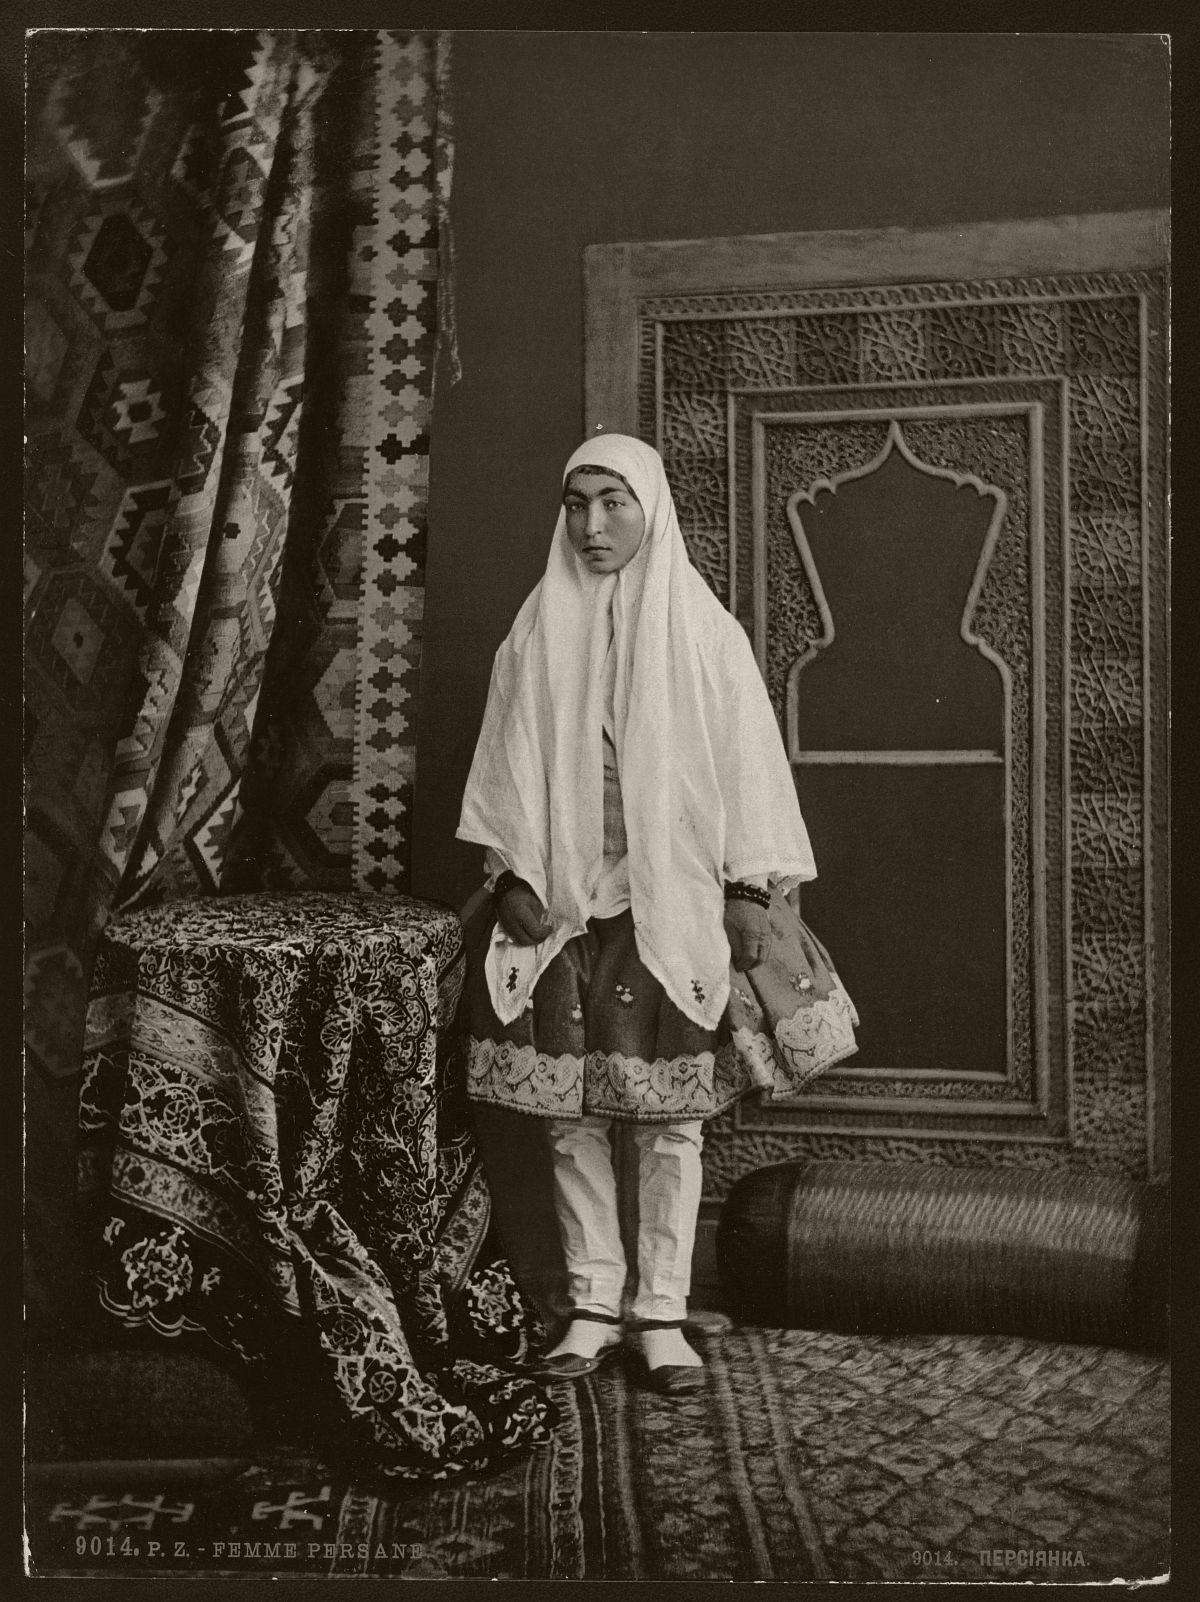 Femme Persane